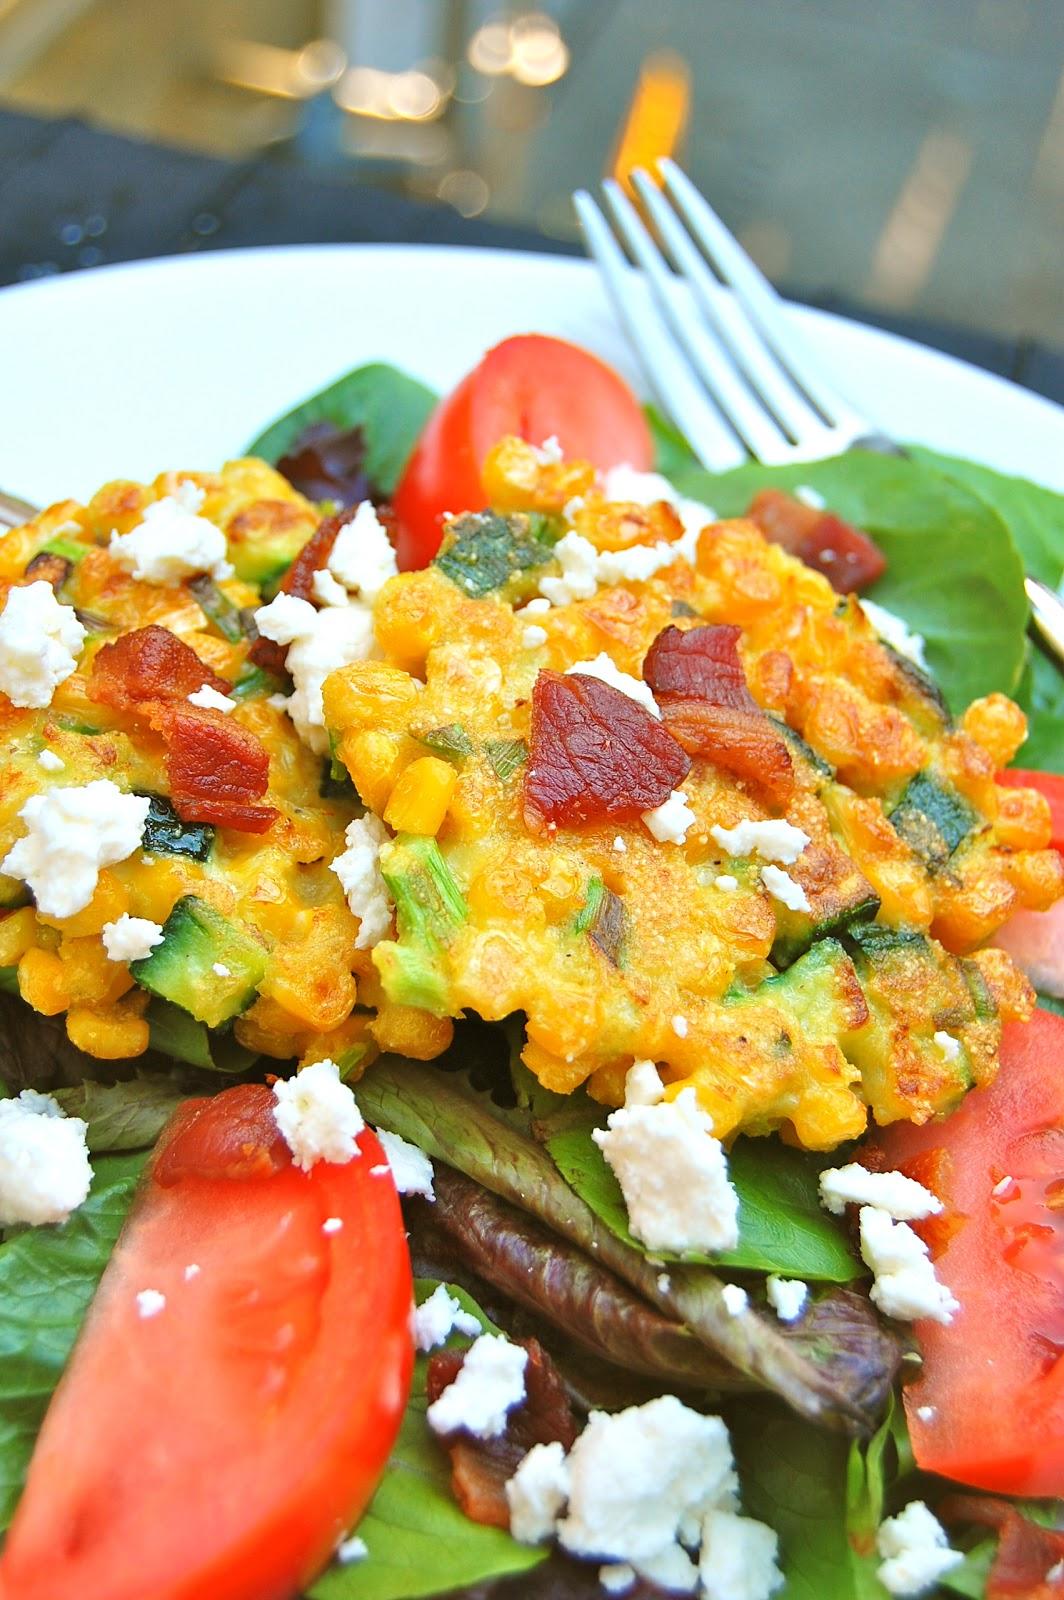 La Petite Maison Verte: Mixed Green Salad with Sweet Corn ...